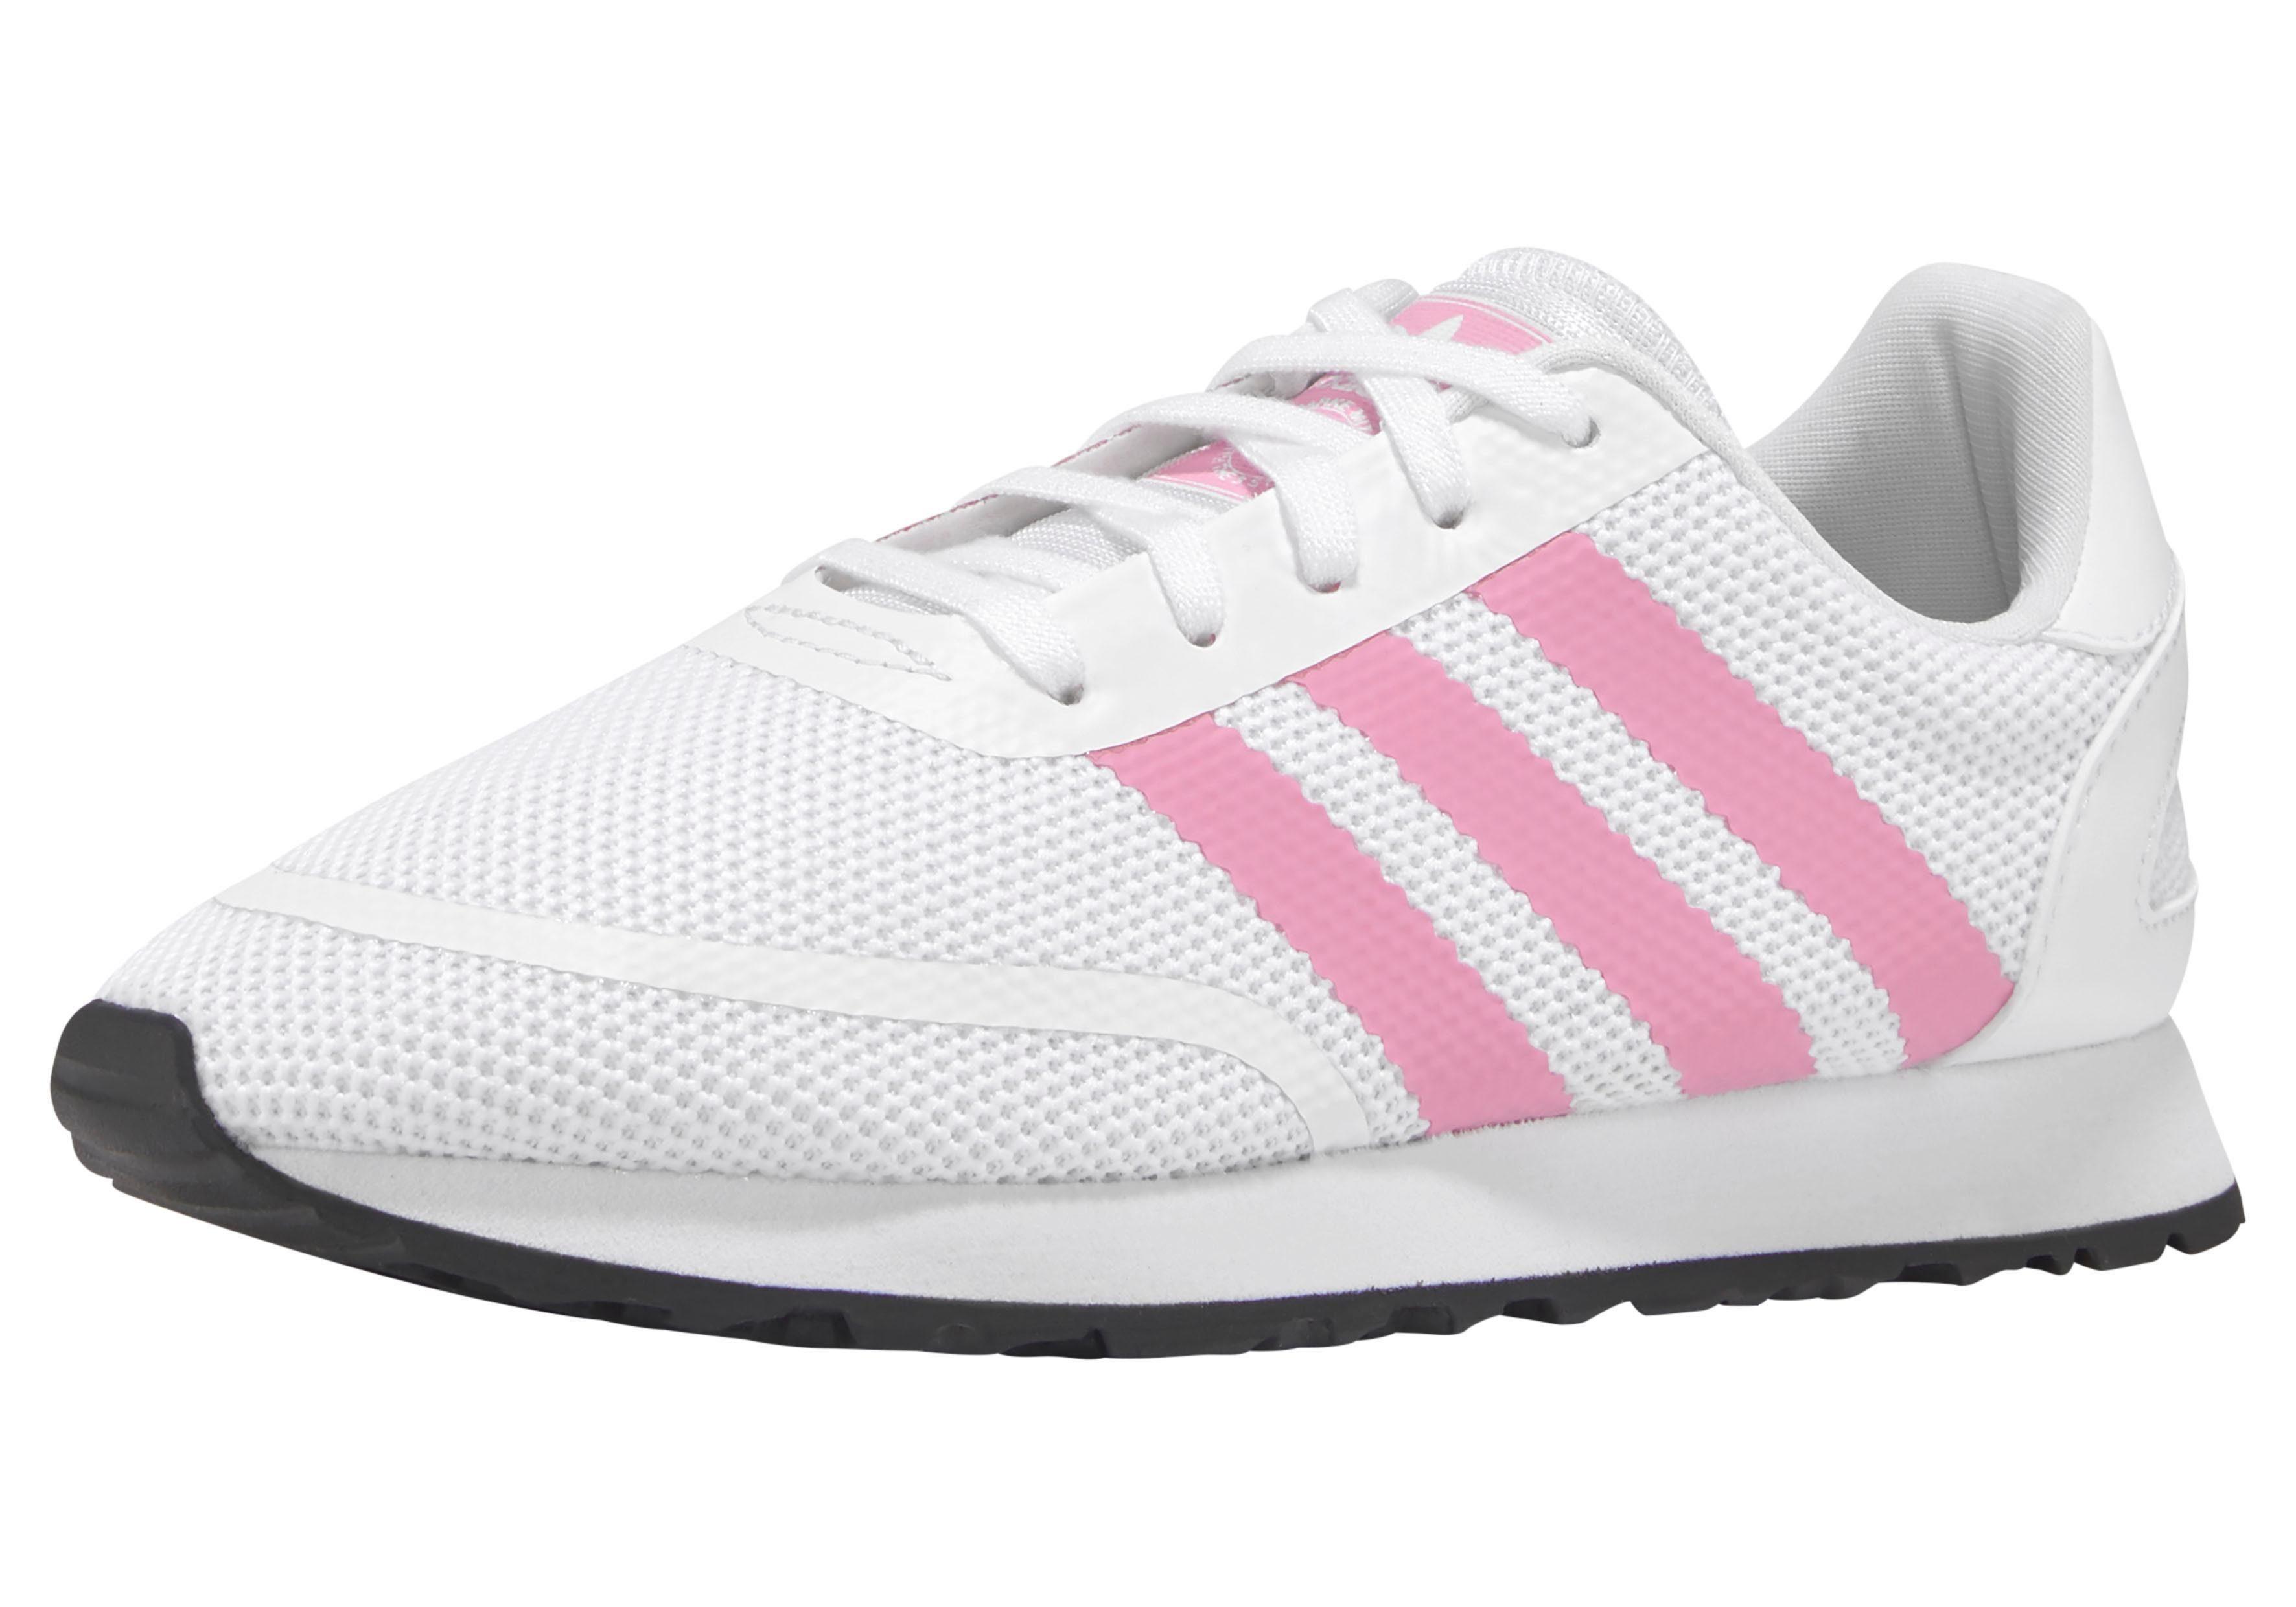 adidas Originals N 5923 Sneaker Grün Weiss |Streetstyle